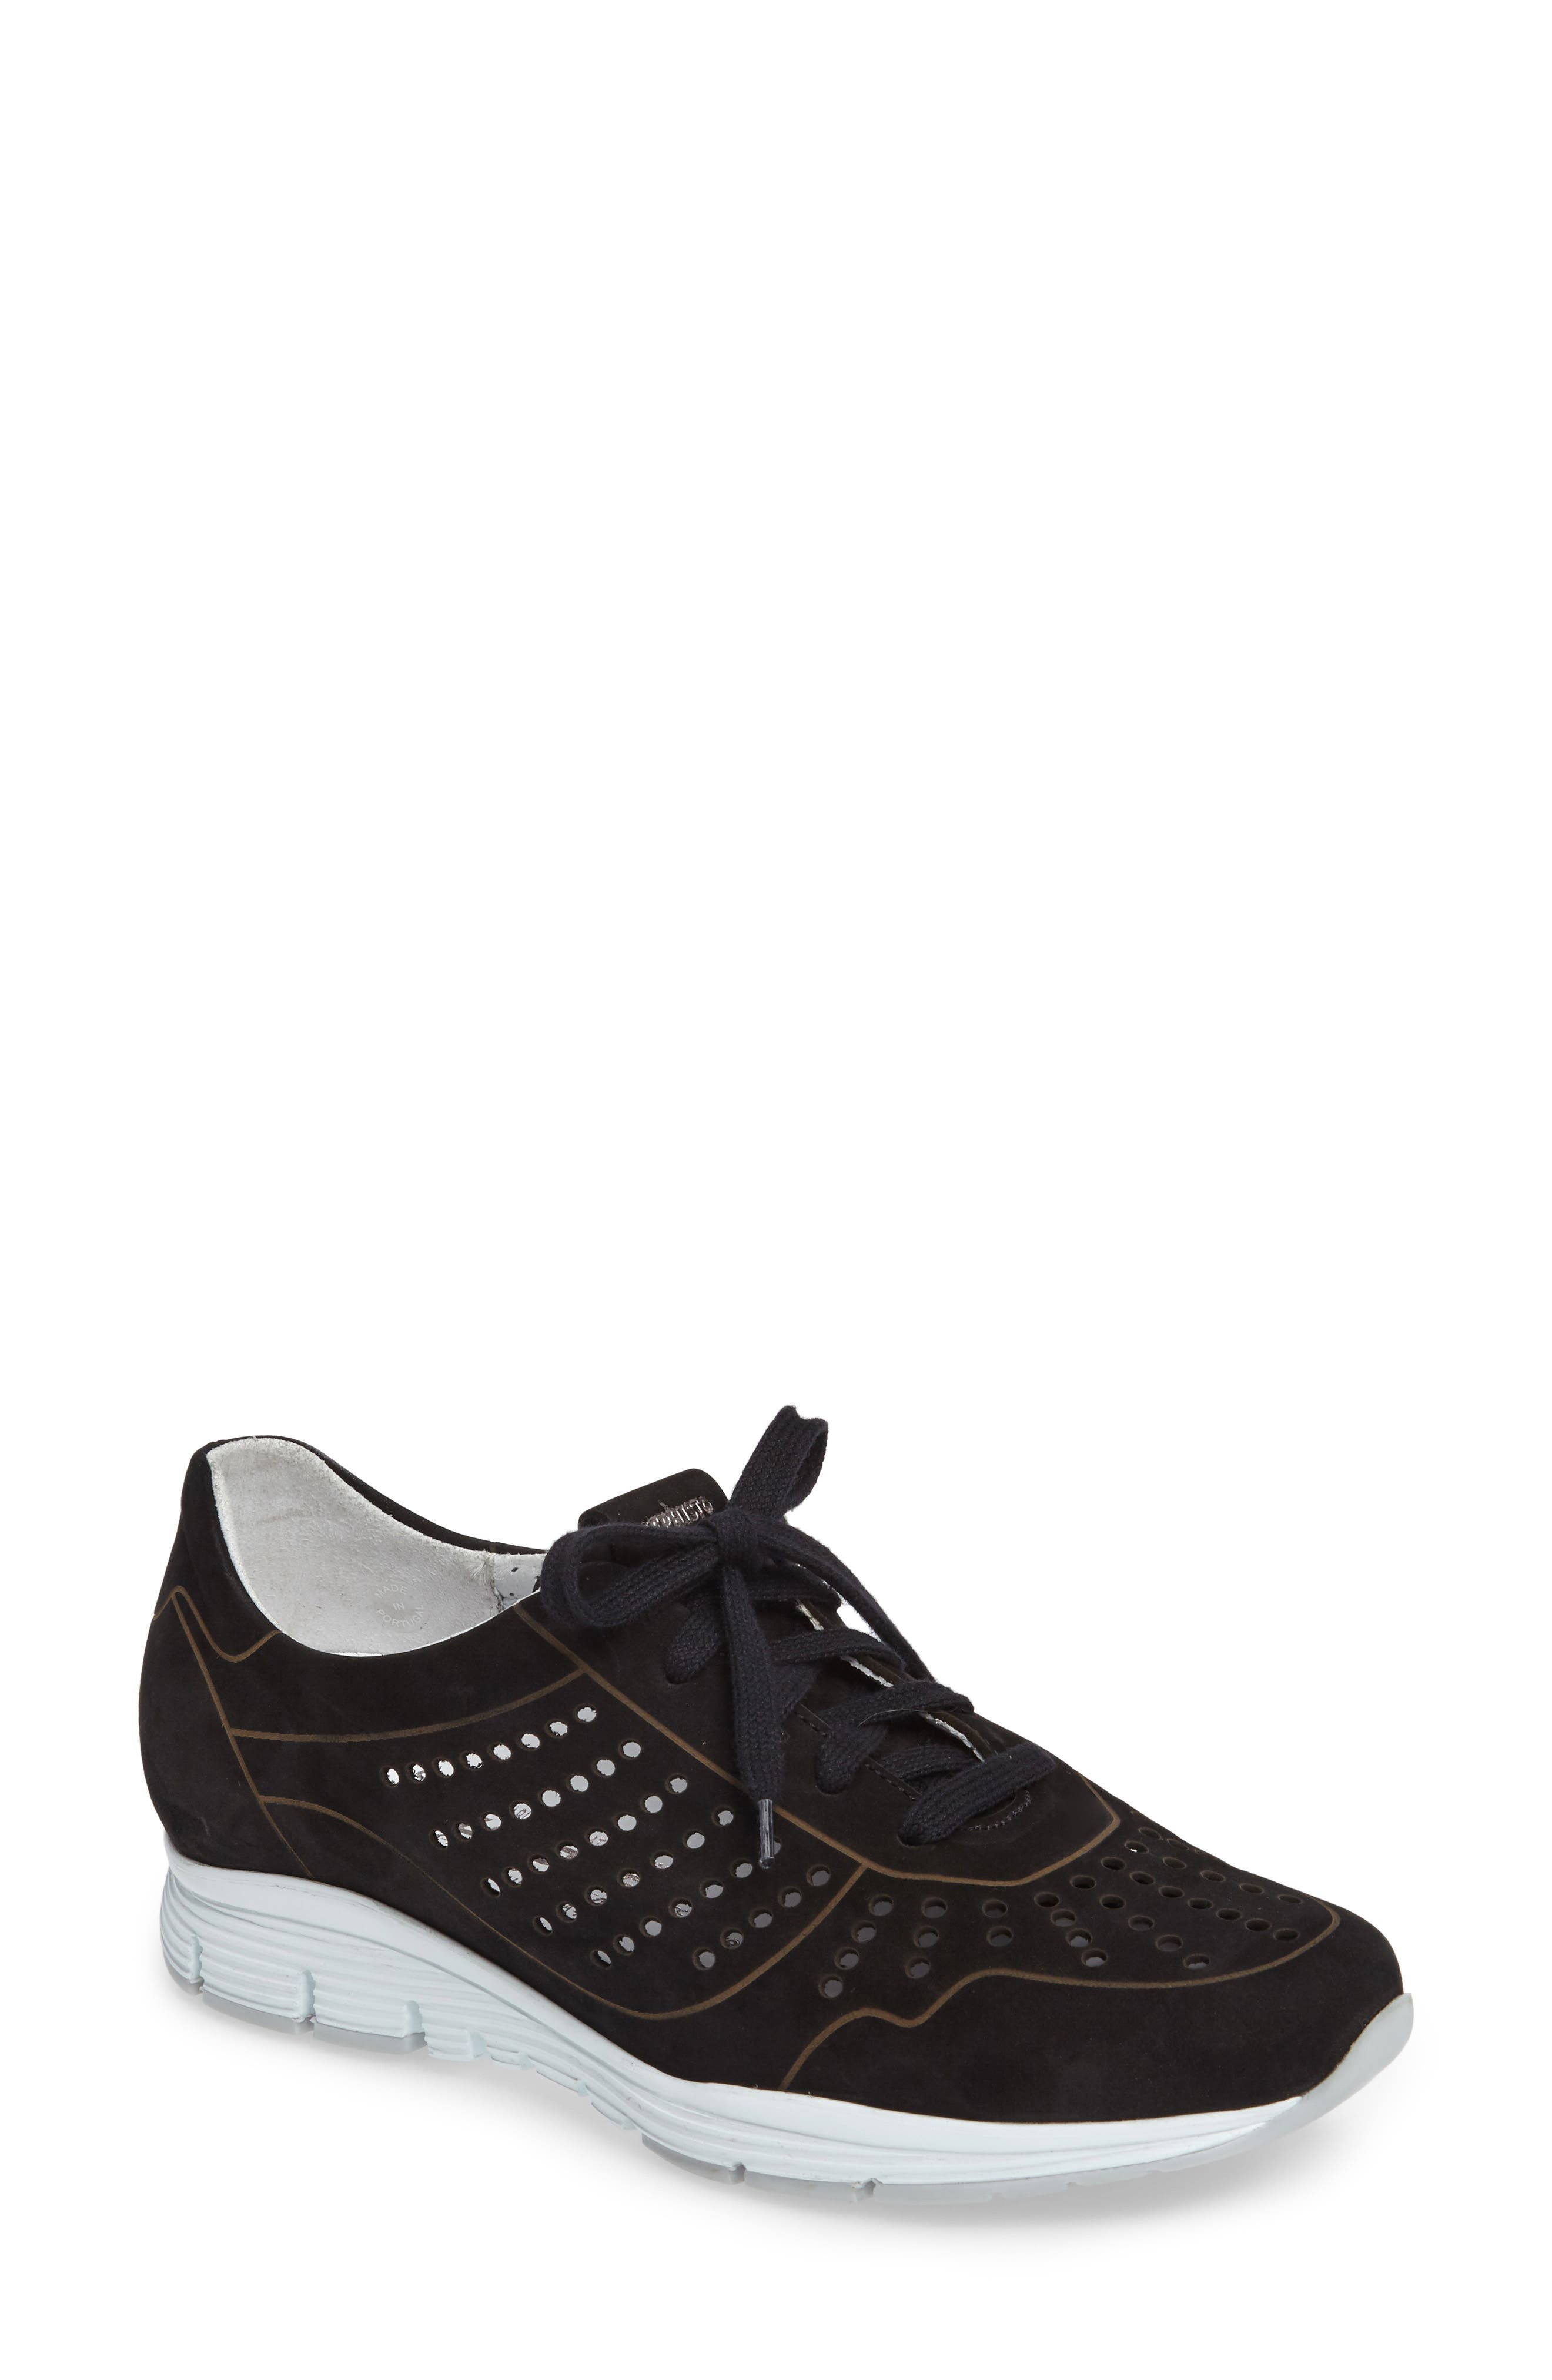 Alternate Image 1 Selected - Mephisto Yliane Sneaker (Women)